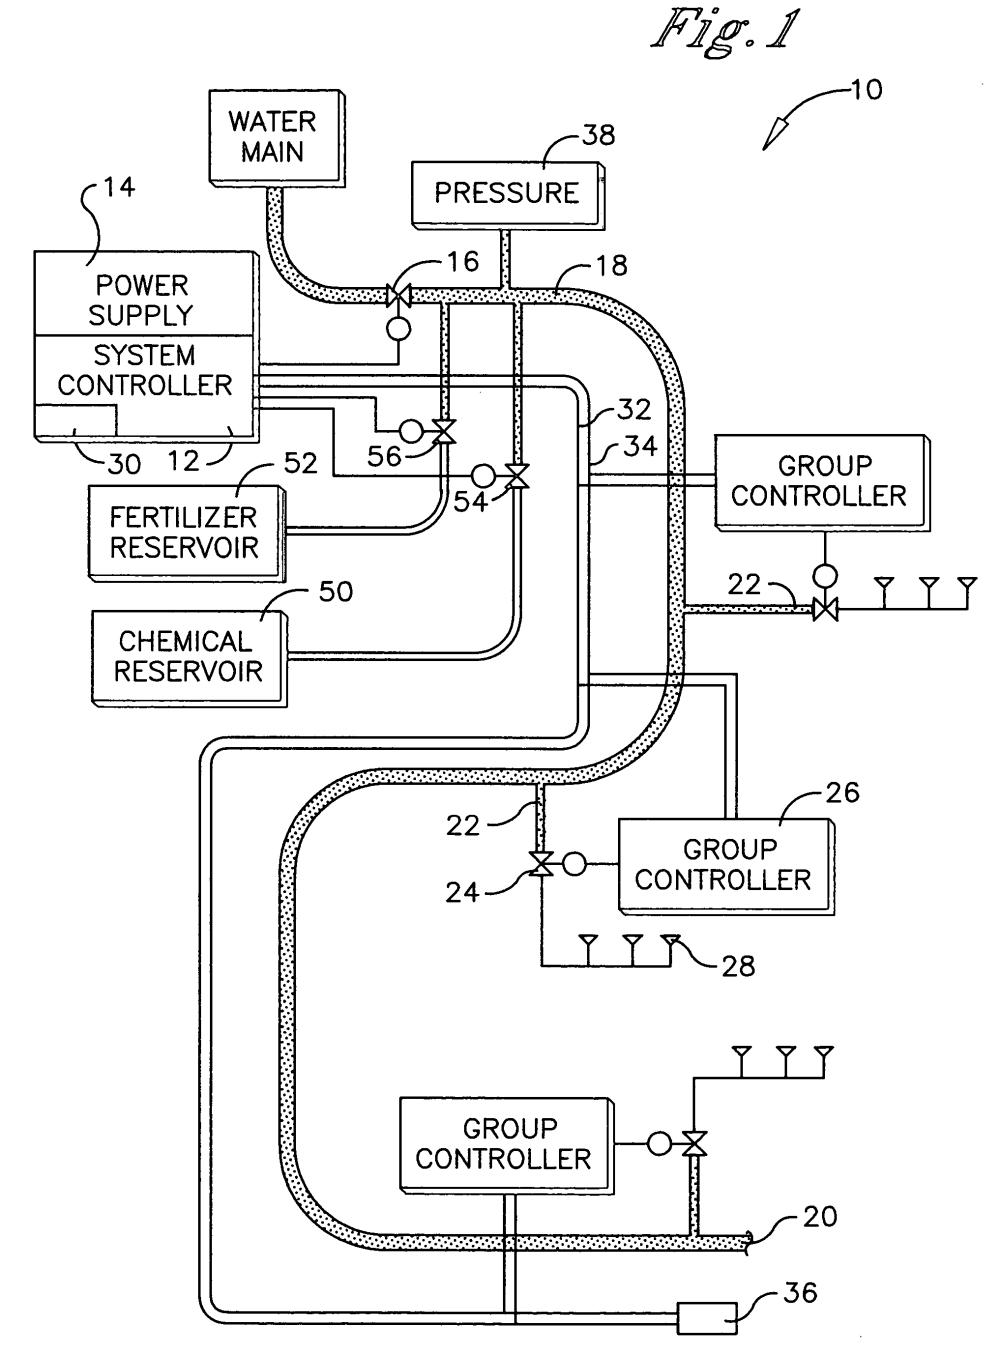 medium resolution of sprinkler valve diagram lawn sprinkler system diagram theamplifier wiring diagrams besides toro sprinkler head diagram on rainbird valve